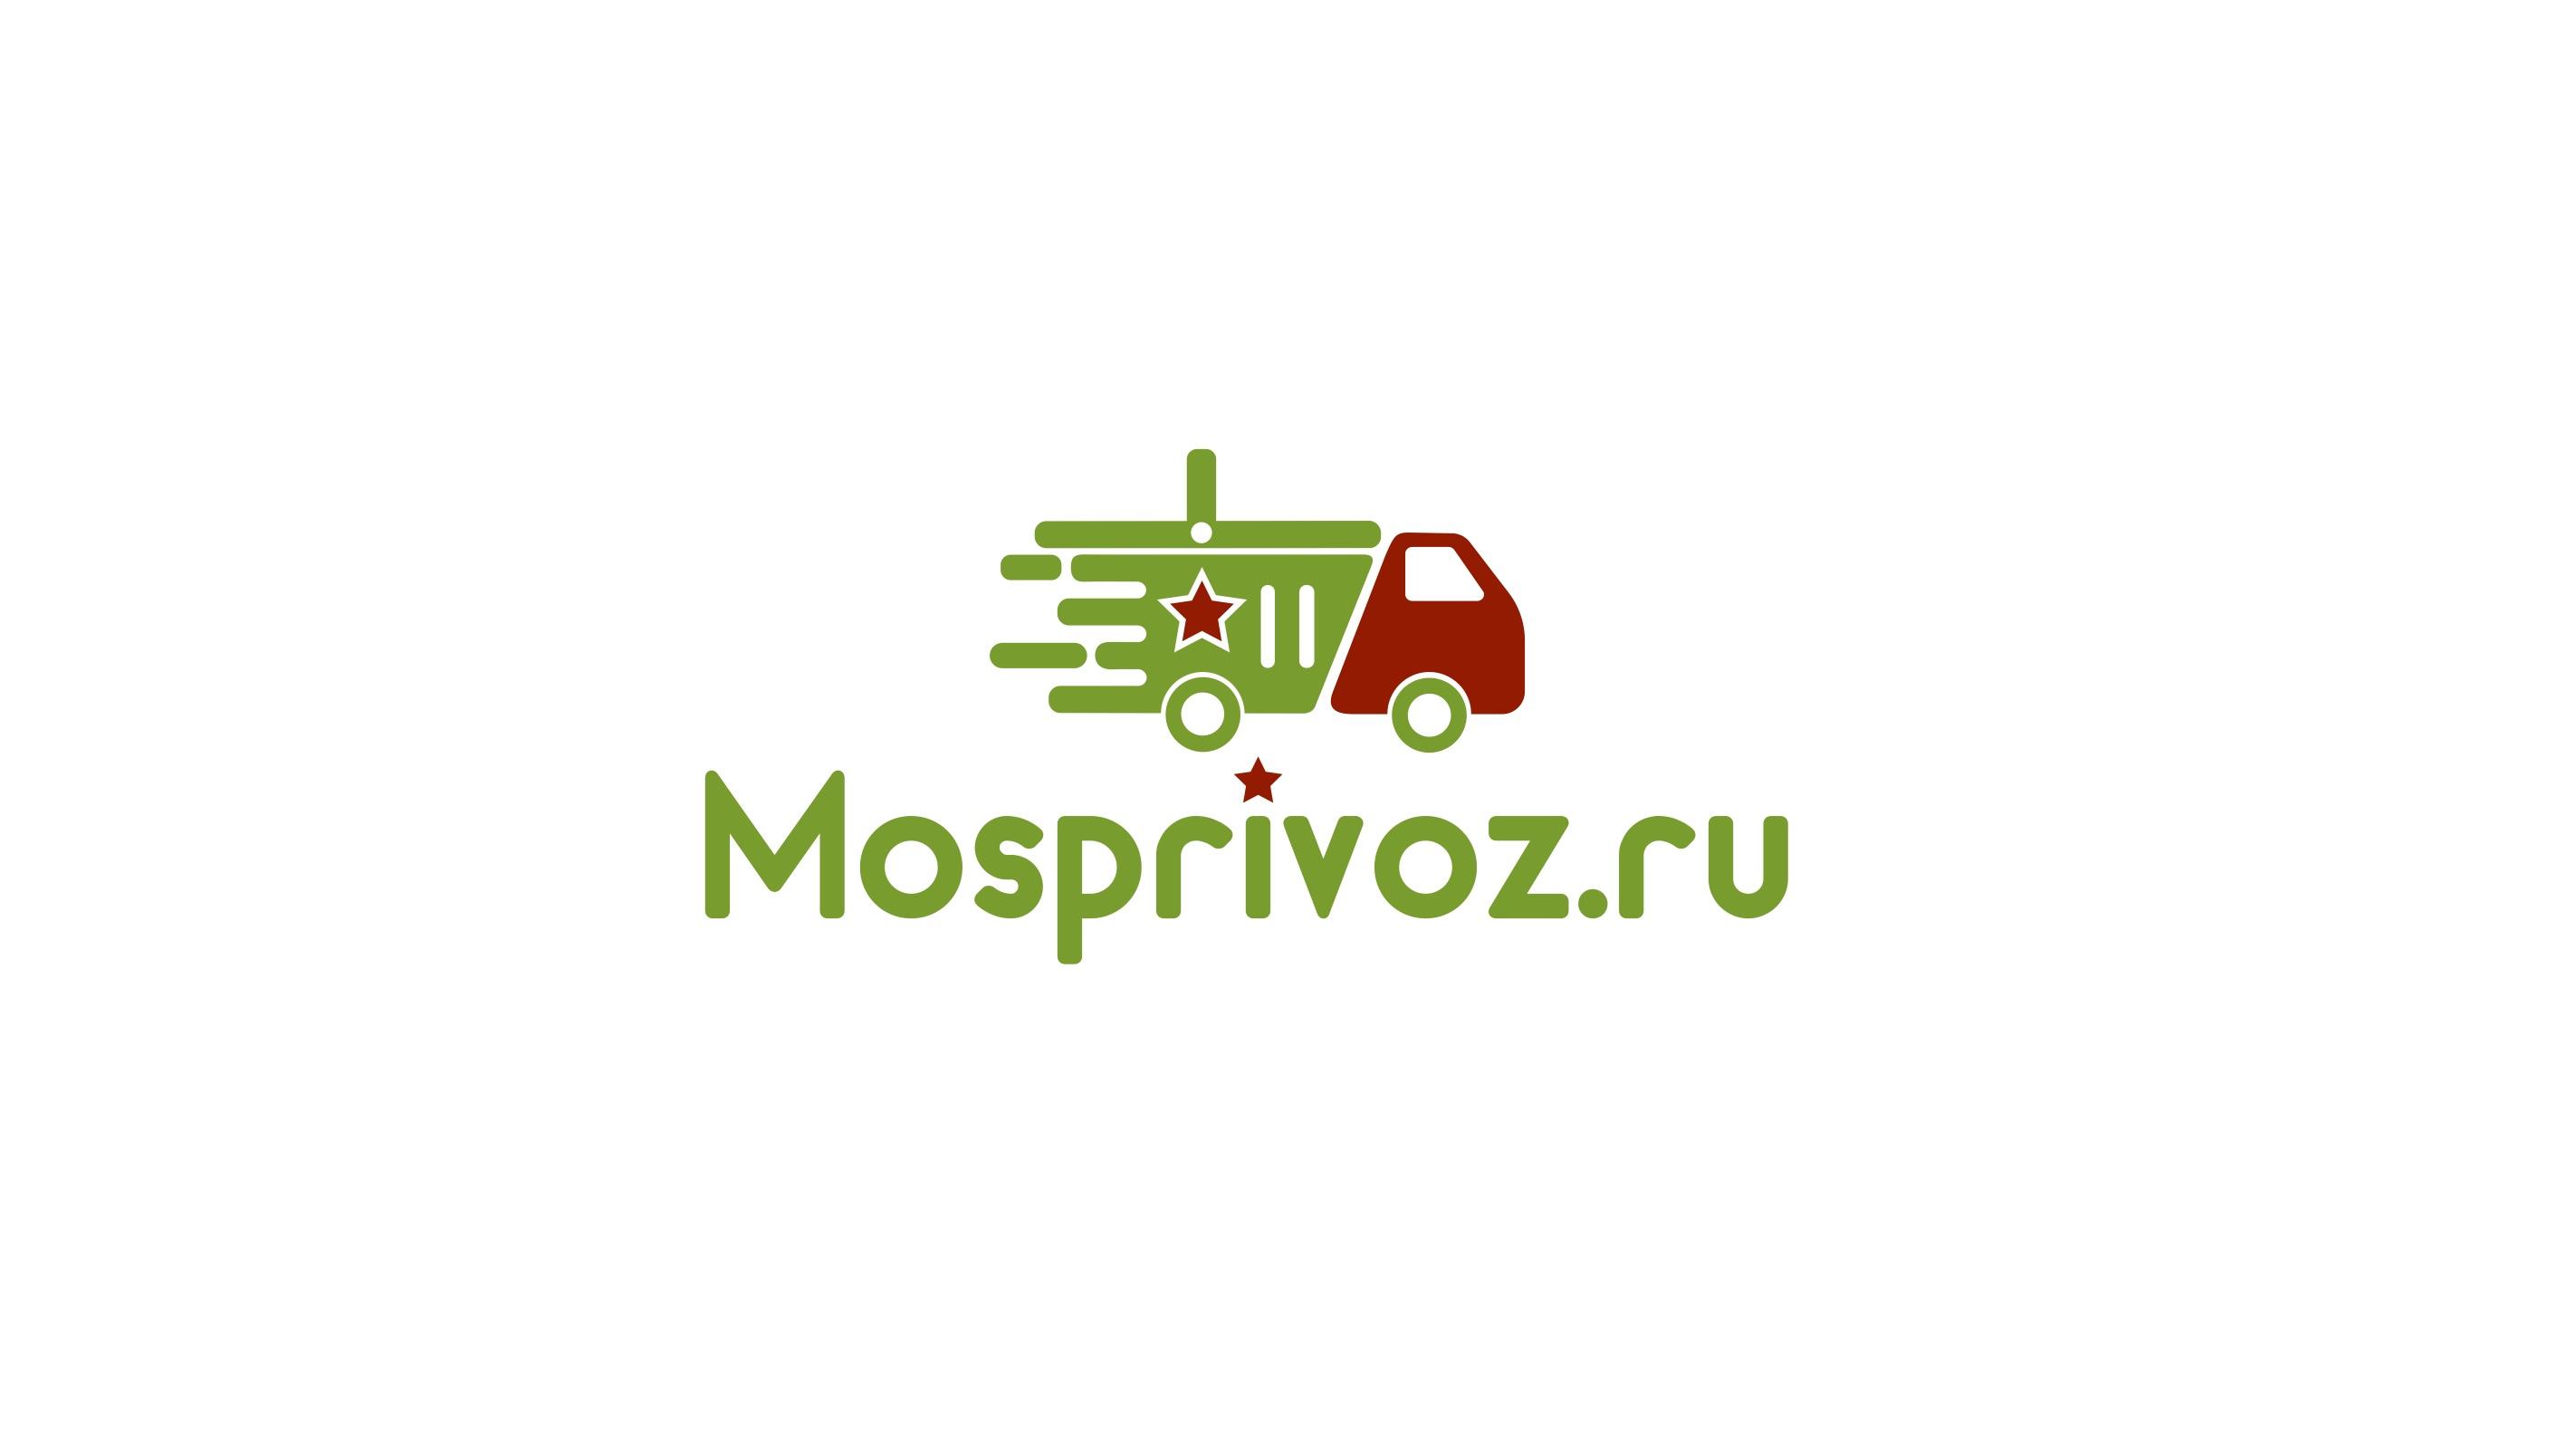 Логотип. Интернет - магазин по доставке продуктов питания. фото f_3465ad44048a7565.jpg